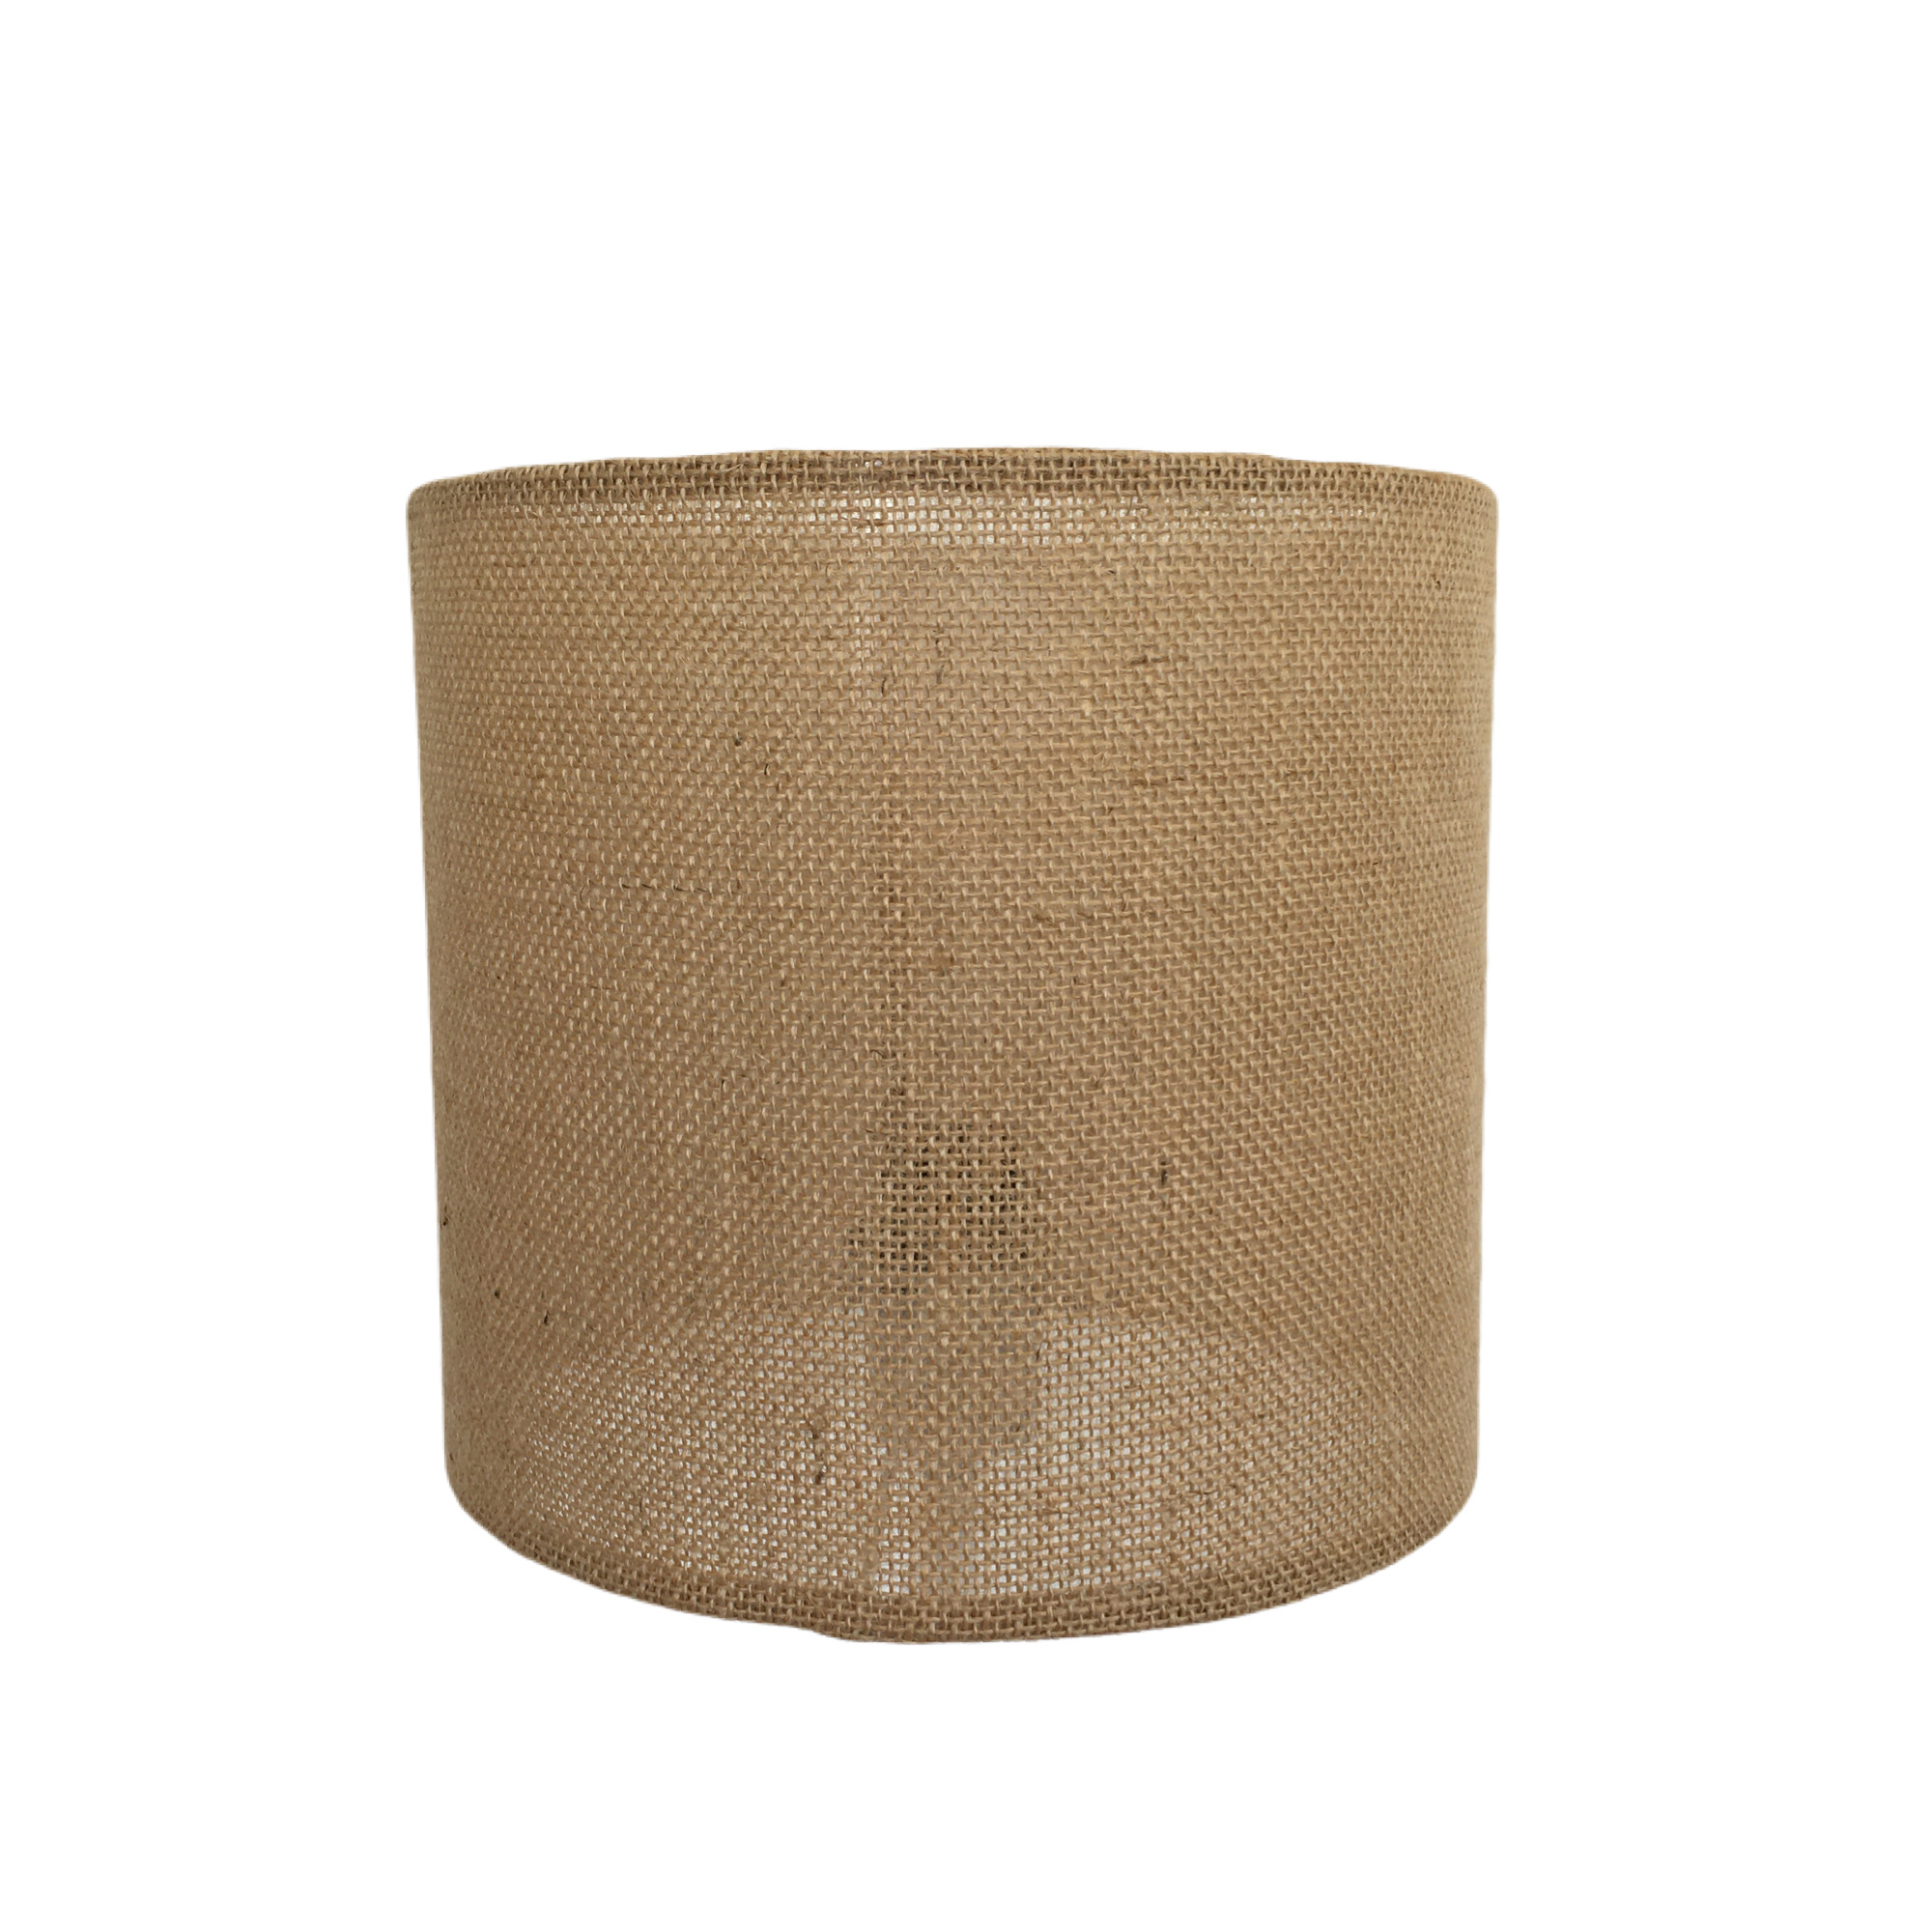 Suspension toile de jute diamètre 30 cm